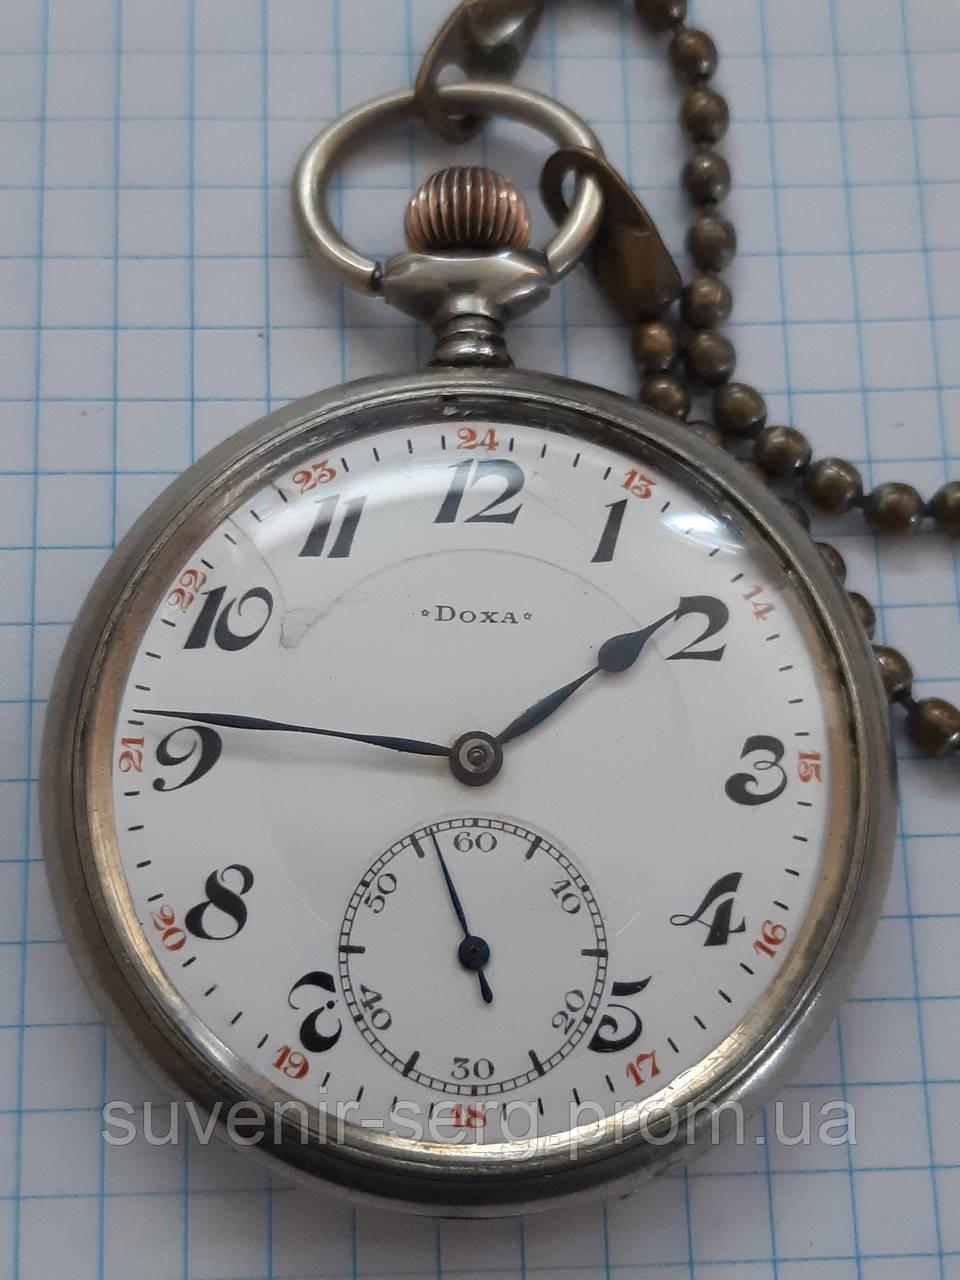 Старинные карманные продам часы часа ломбарды краснодара 24